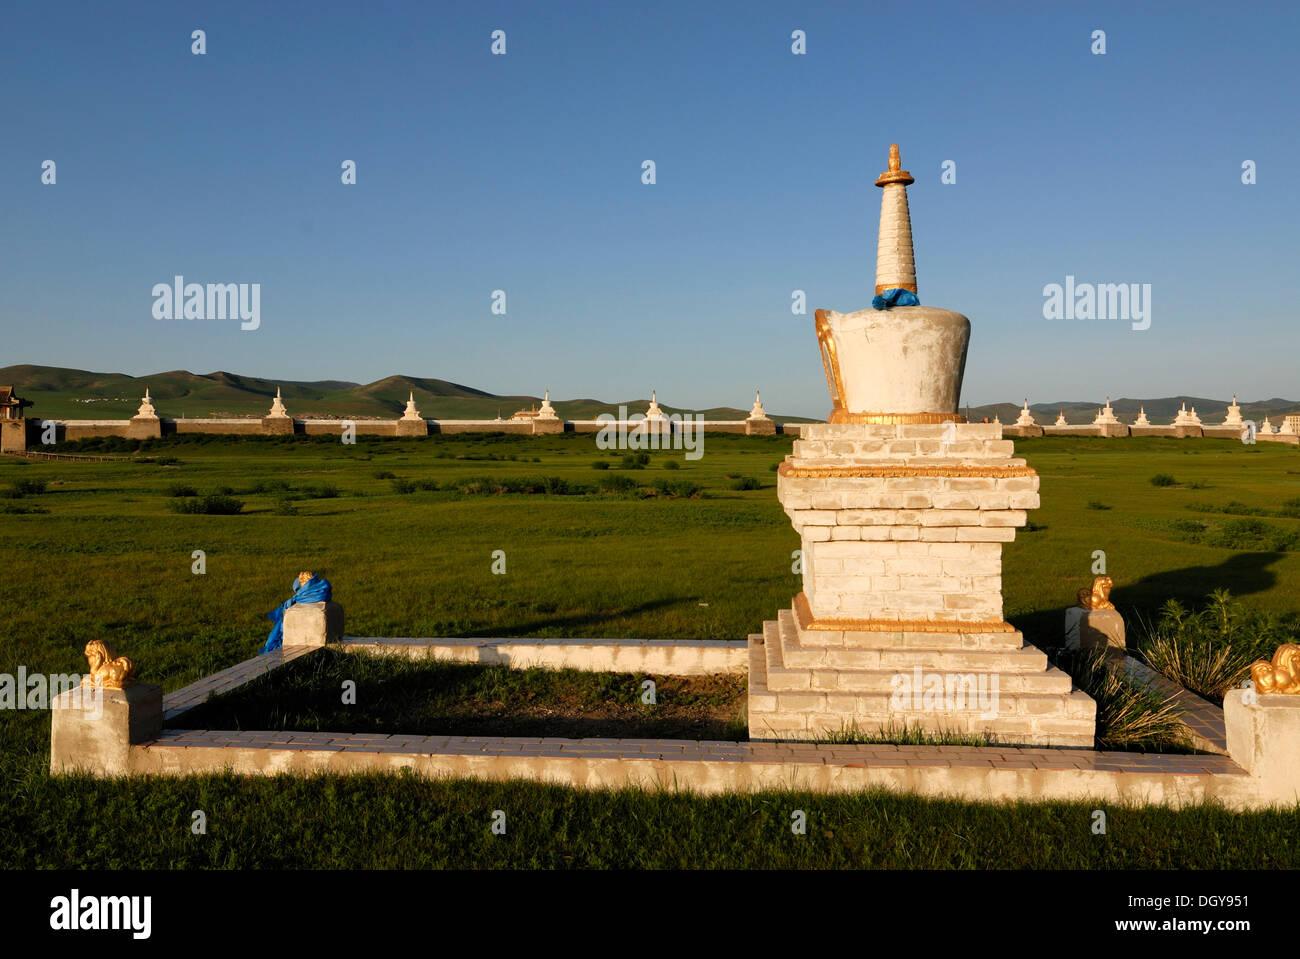 Stupa and outer wall of Erdene Zuu Khiid Monastery, Karakorum, Kharkhorin, Oevoerkhangai Aimak, Mongolia, Asia - Stock Image